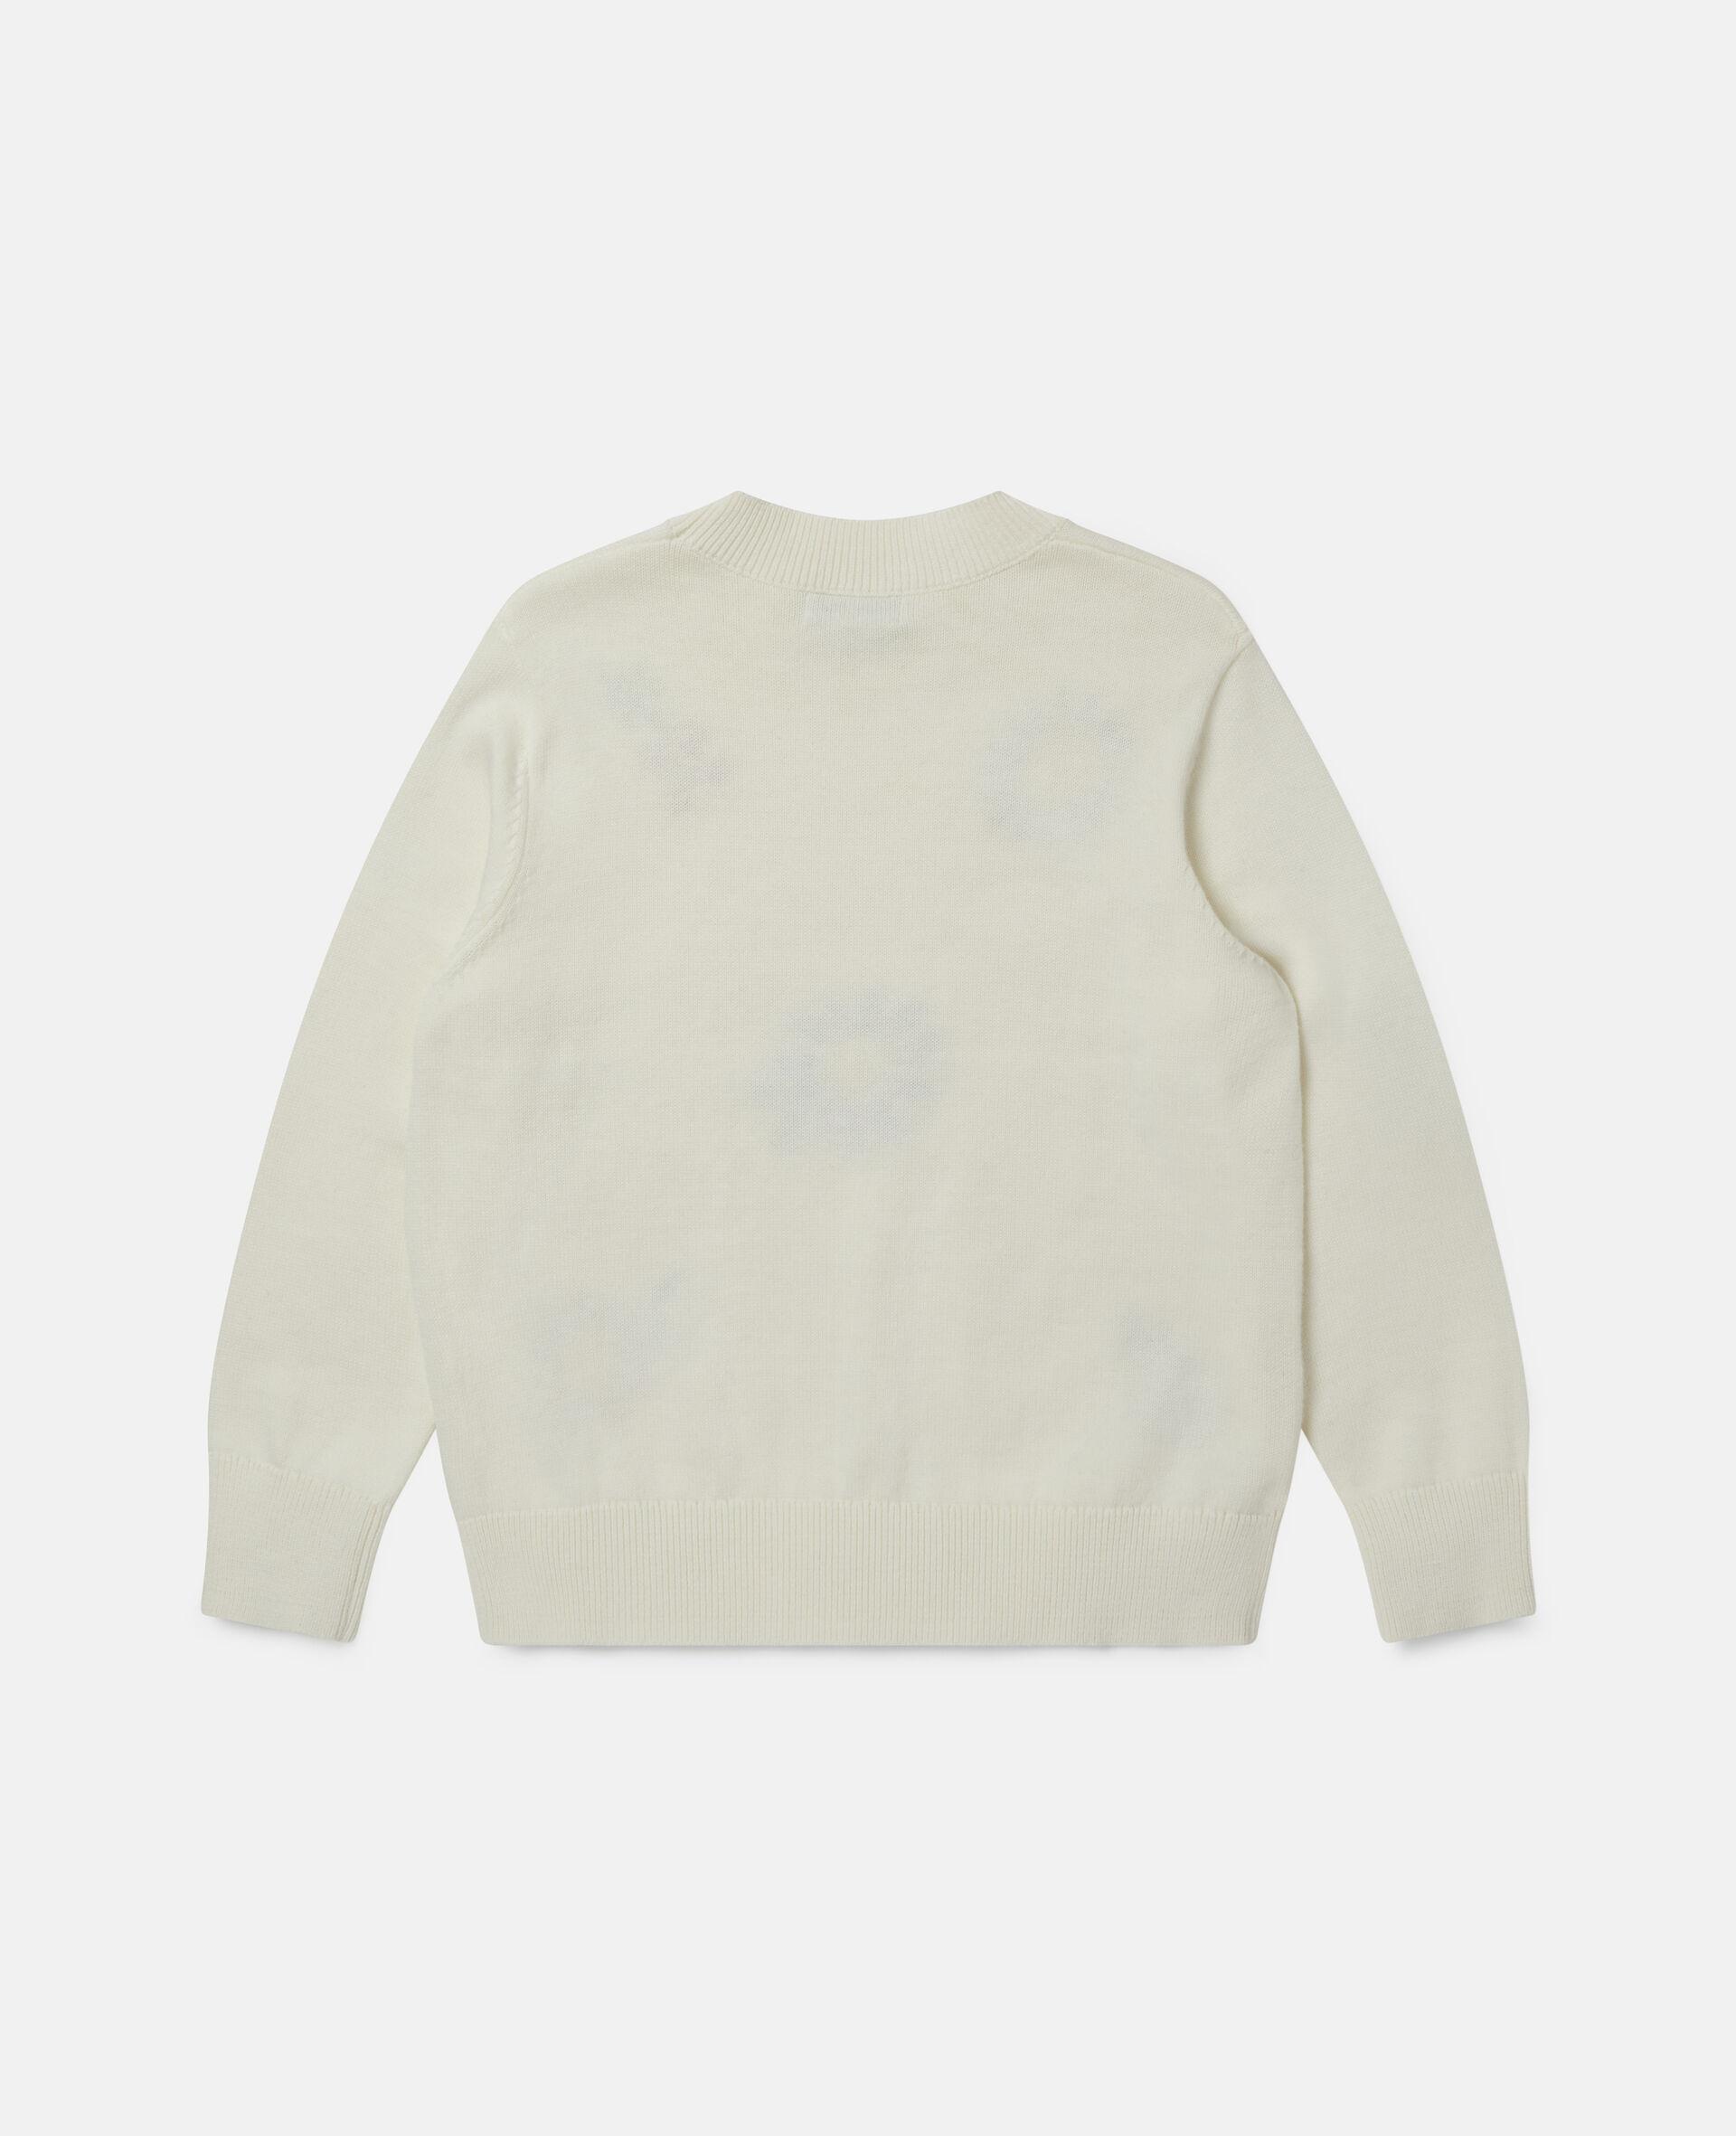 Pull oversize à fleurs brodées-Blanc-large image number 3